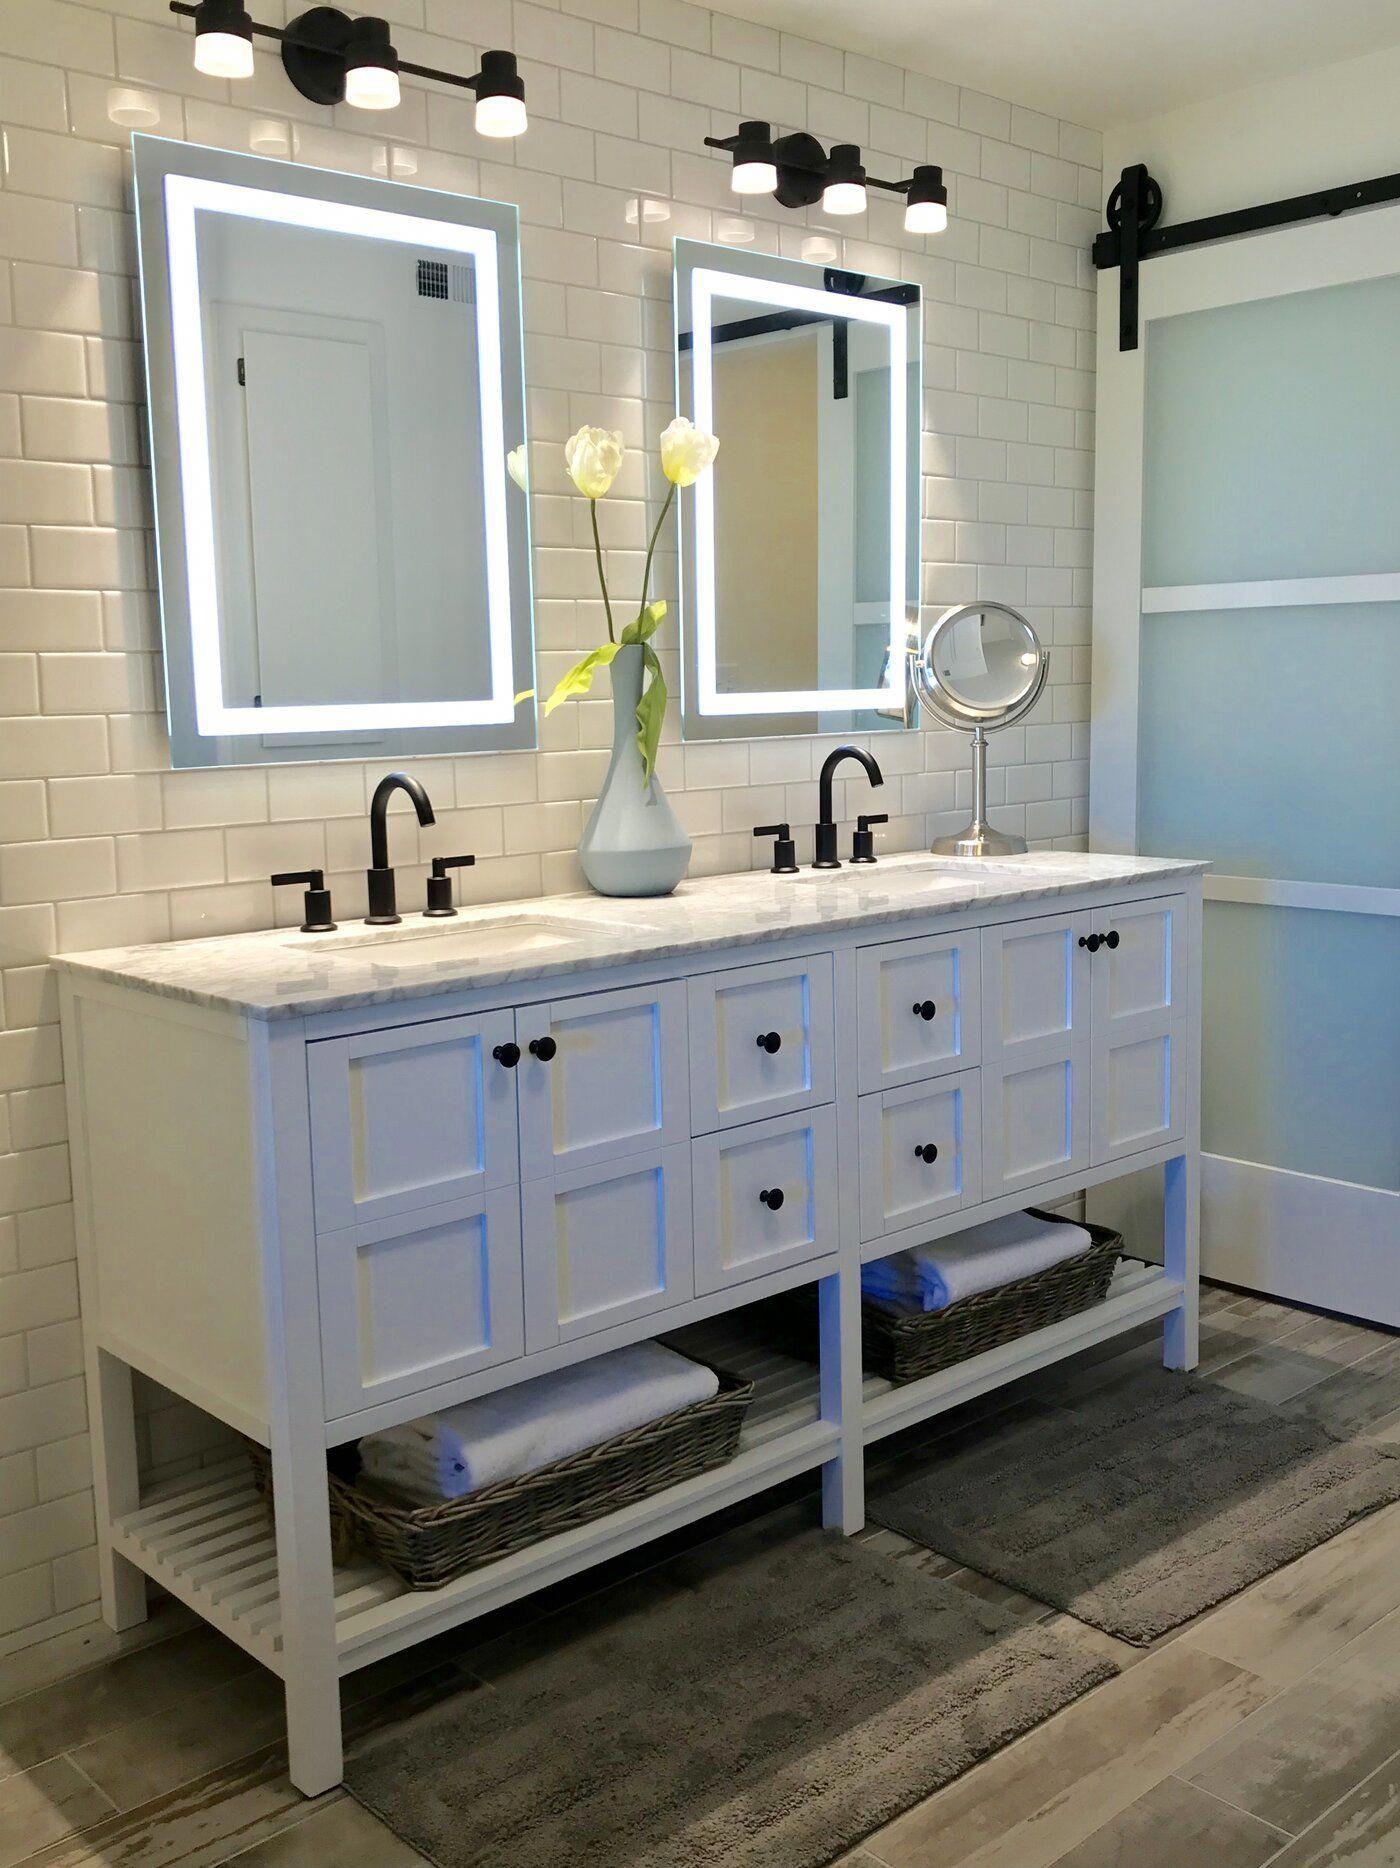 Caldwell 72 Double Bathroom Vanity Set In 2020 Bathroom Layout Small Bathroom Modern Bathroom